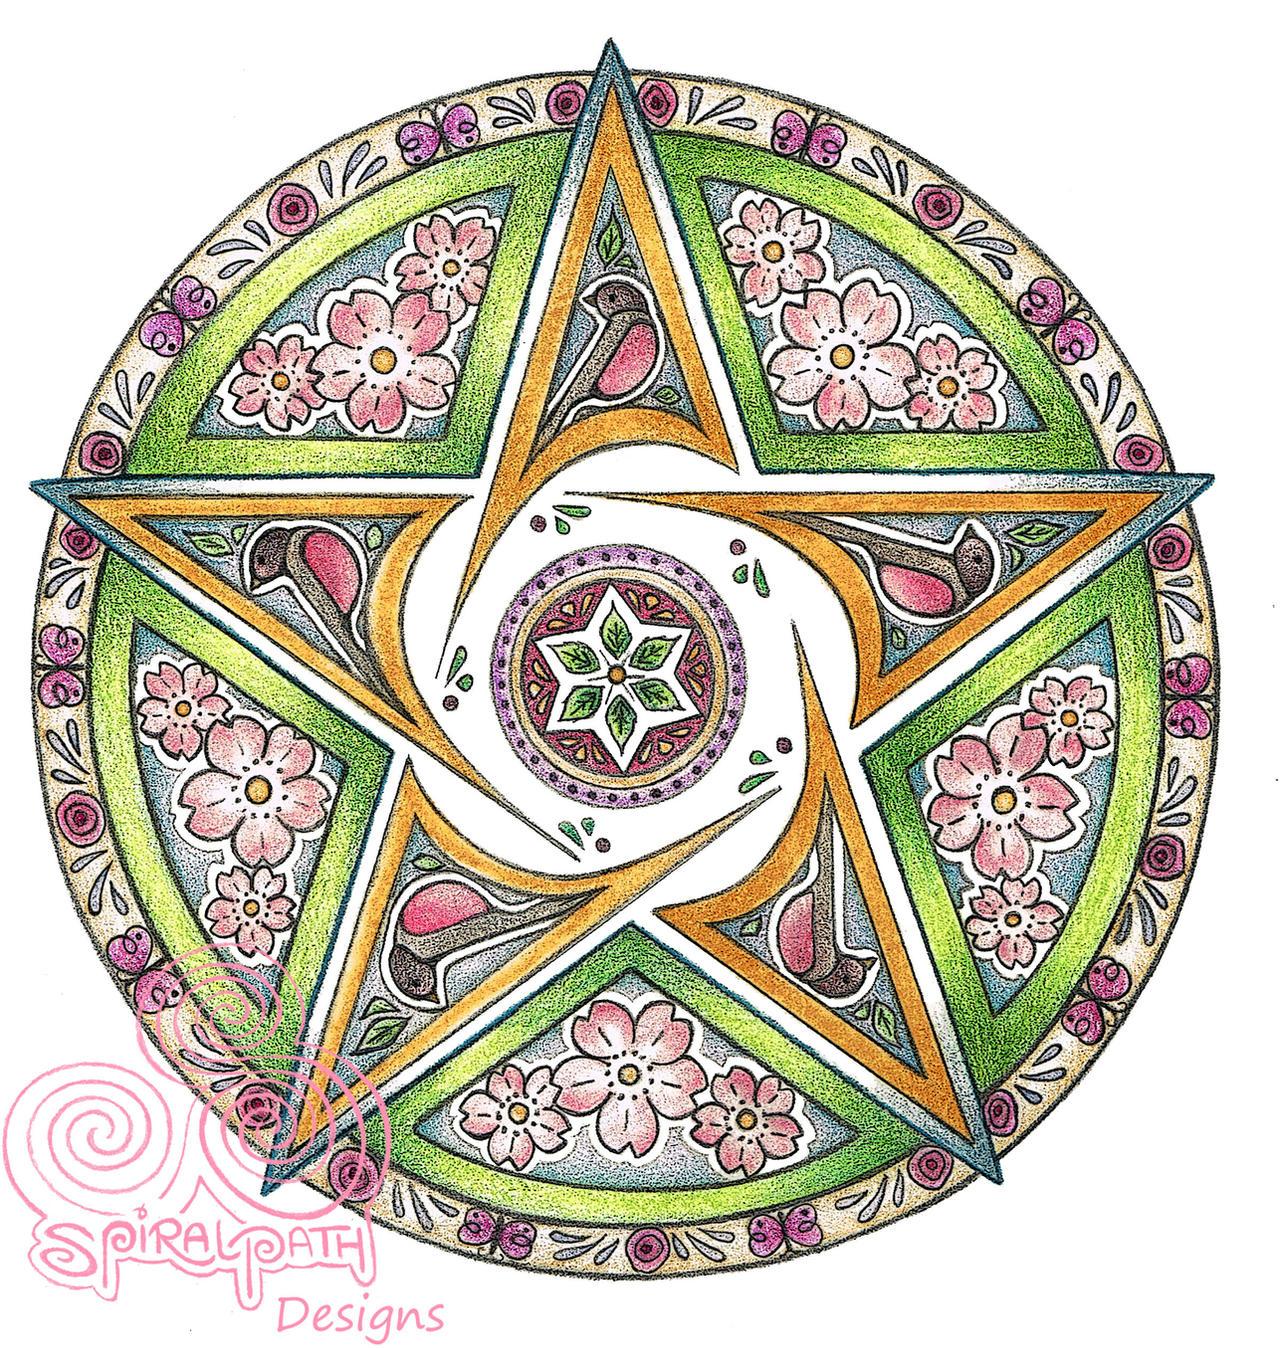 Spring Pentacle Mandala by Spiralpathdesigns